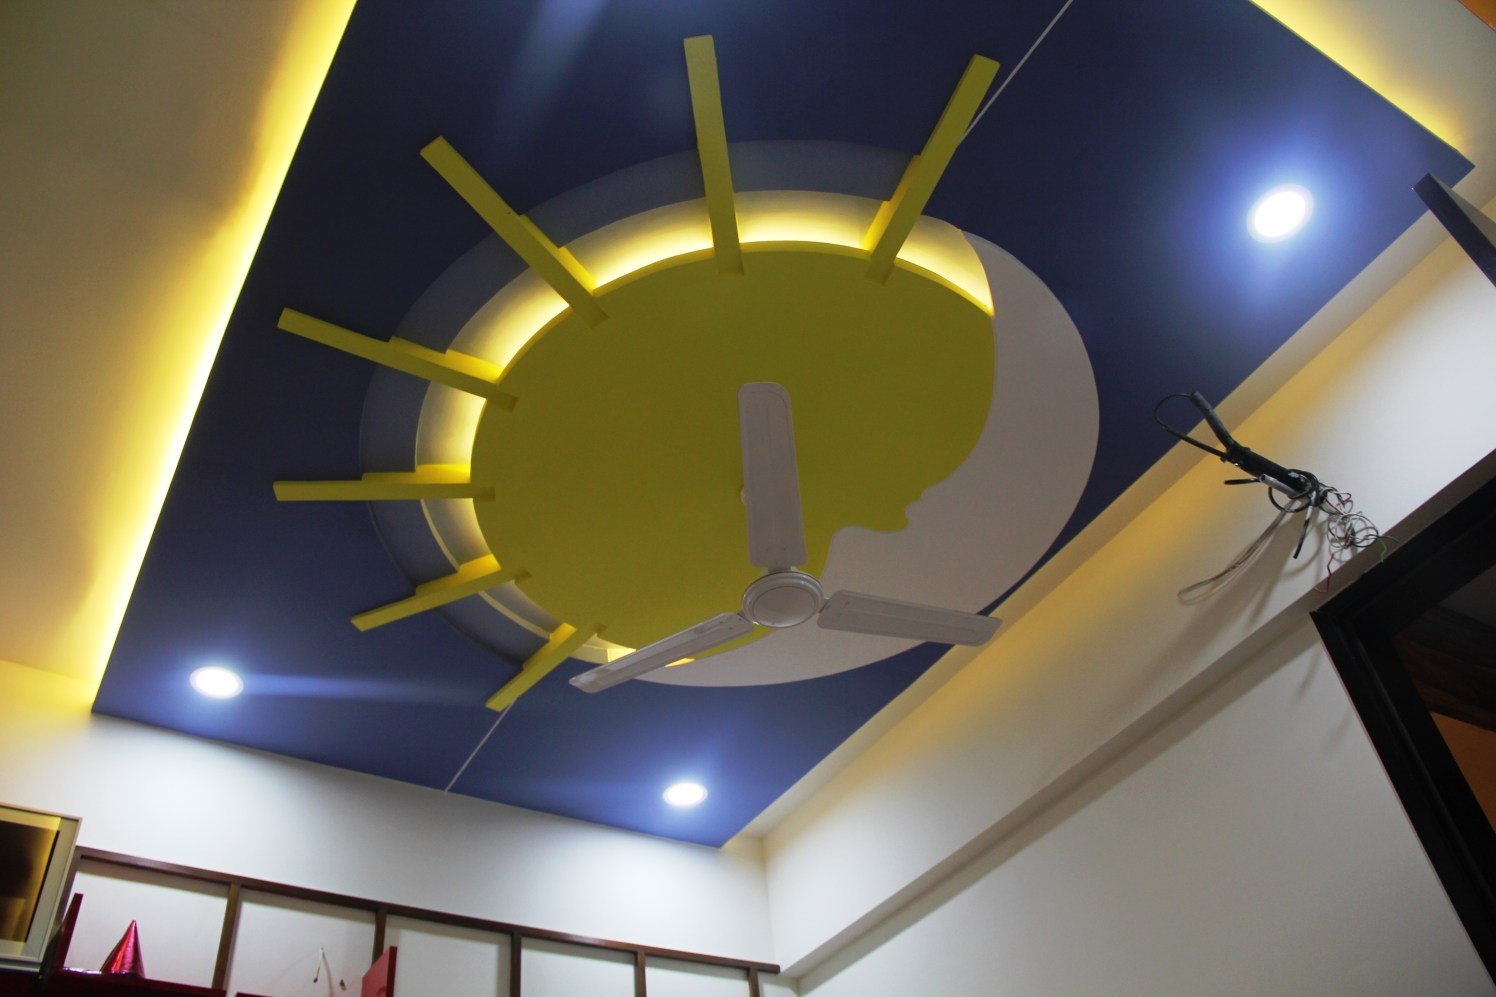 Round False Ceiling by Vibhuti Fotedar Indoor-spaces Modern   Interior Design Photos & Ideas